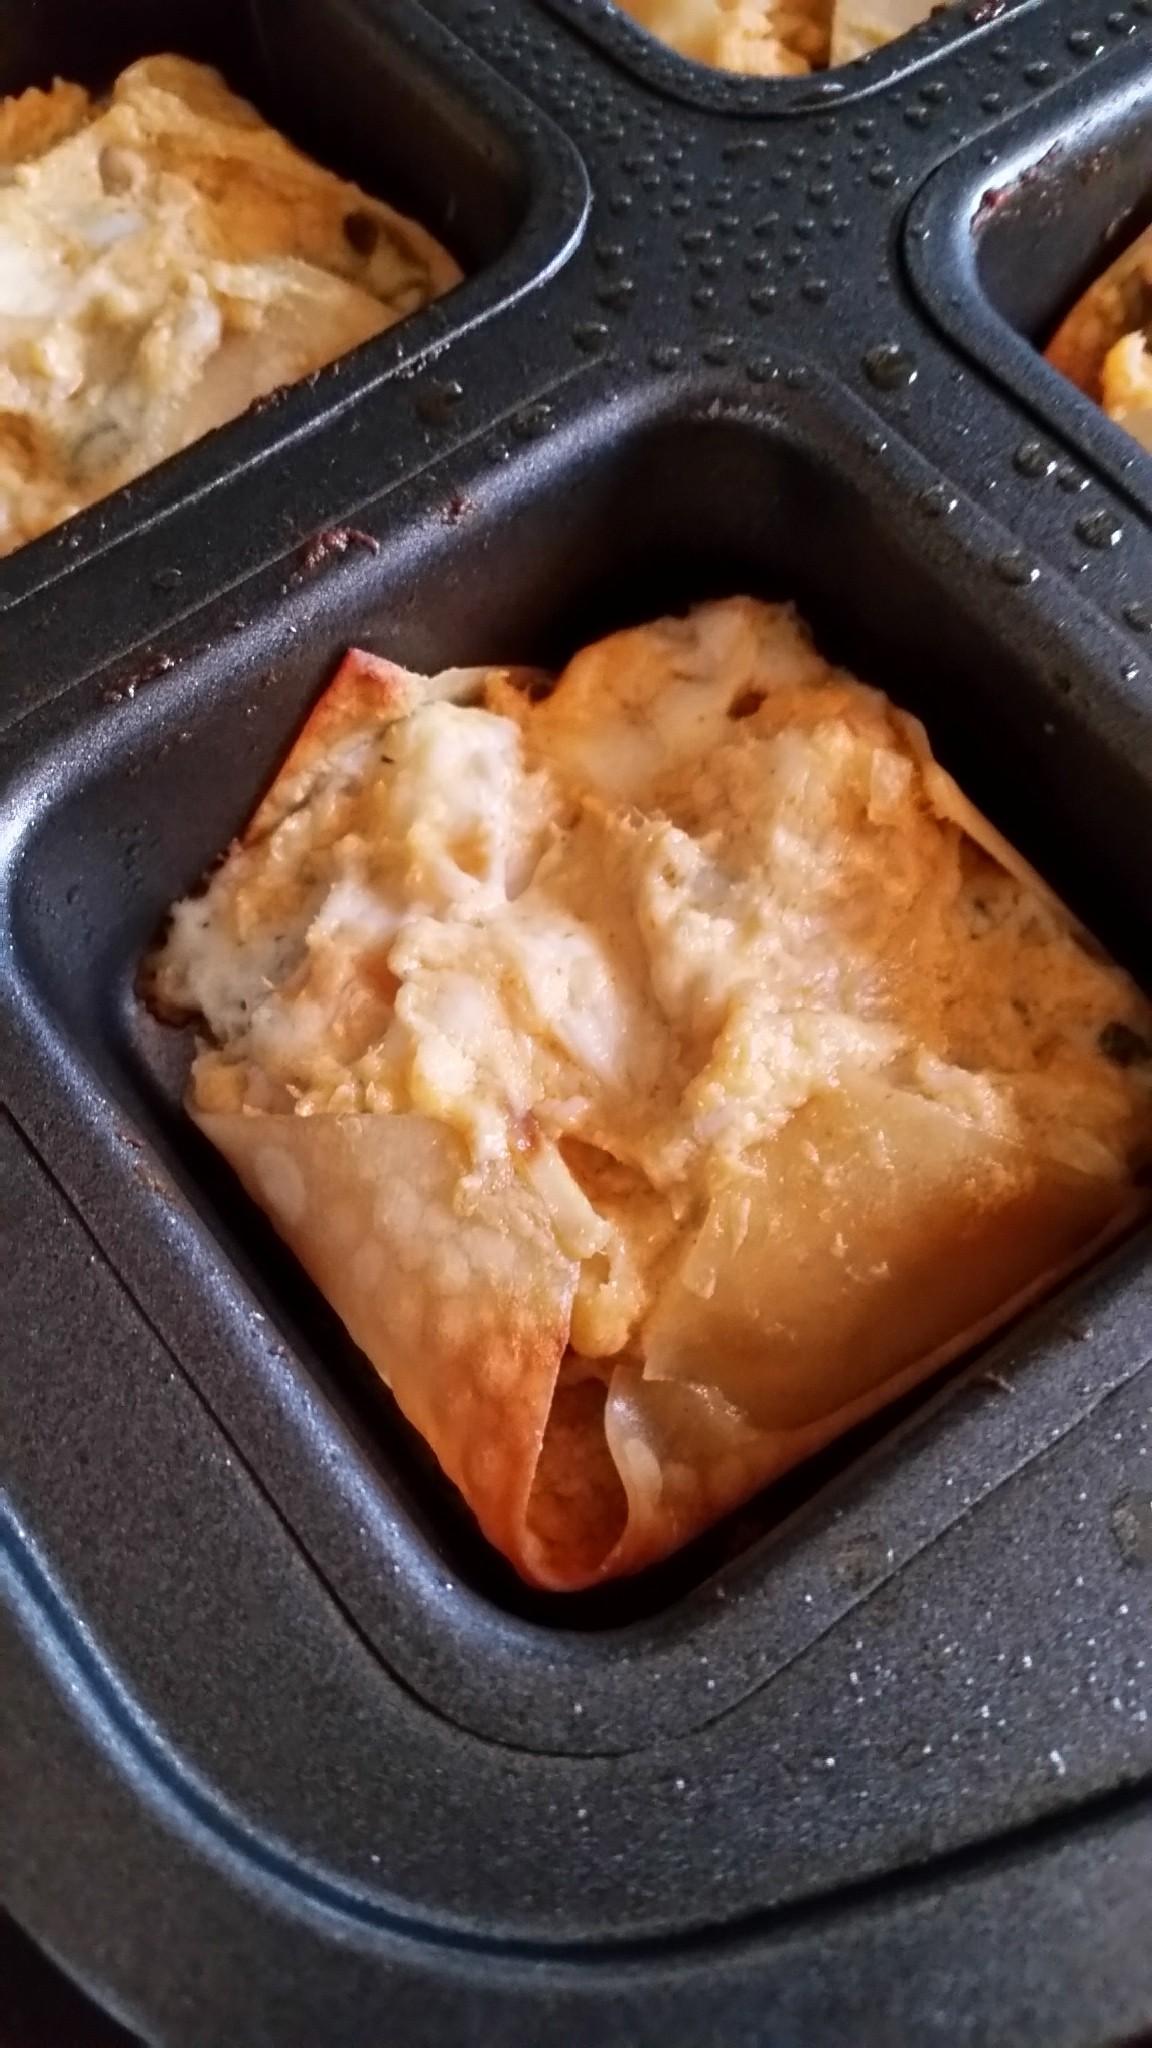 Blue Cheese & Buffalo Chicken Wonton Bites